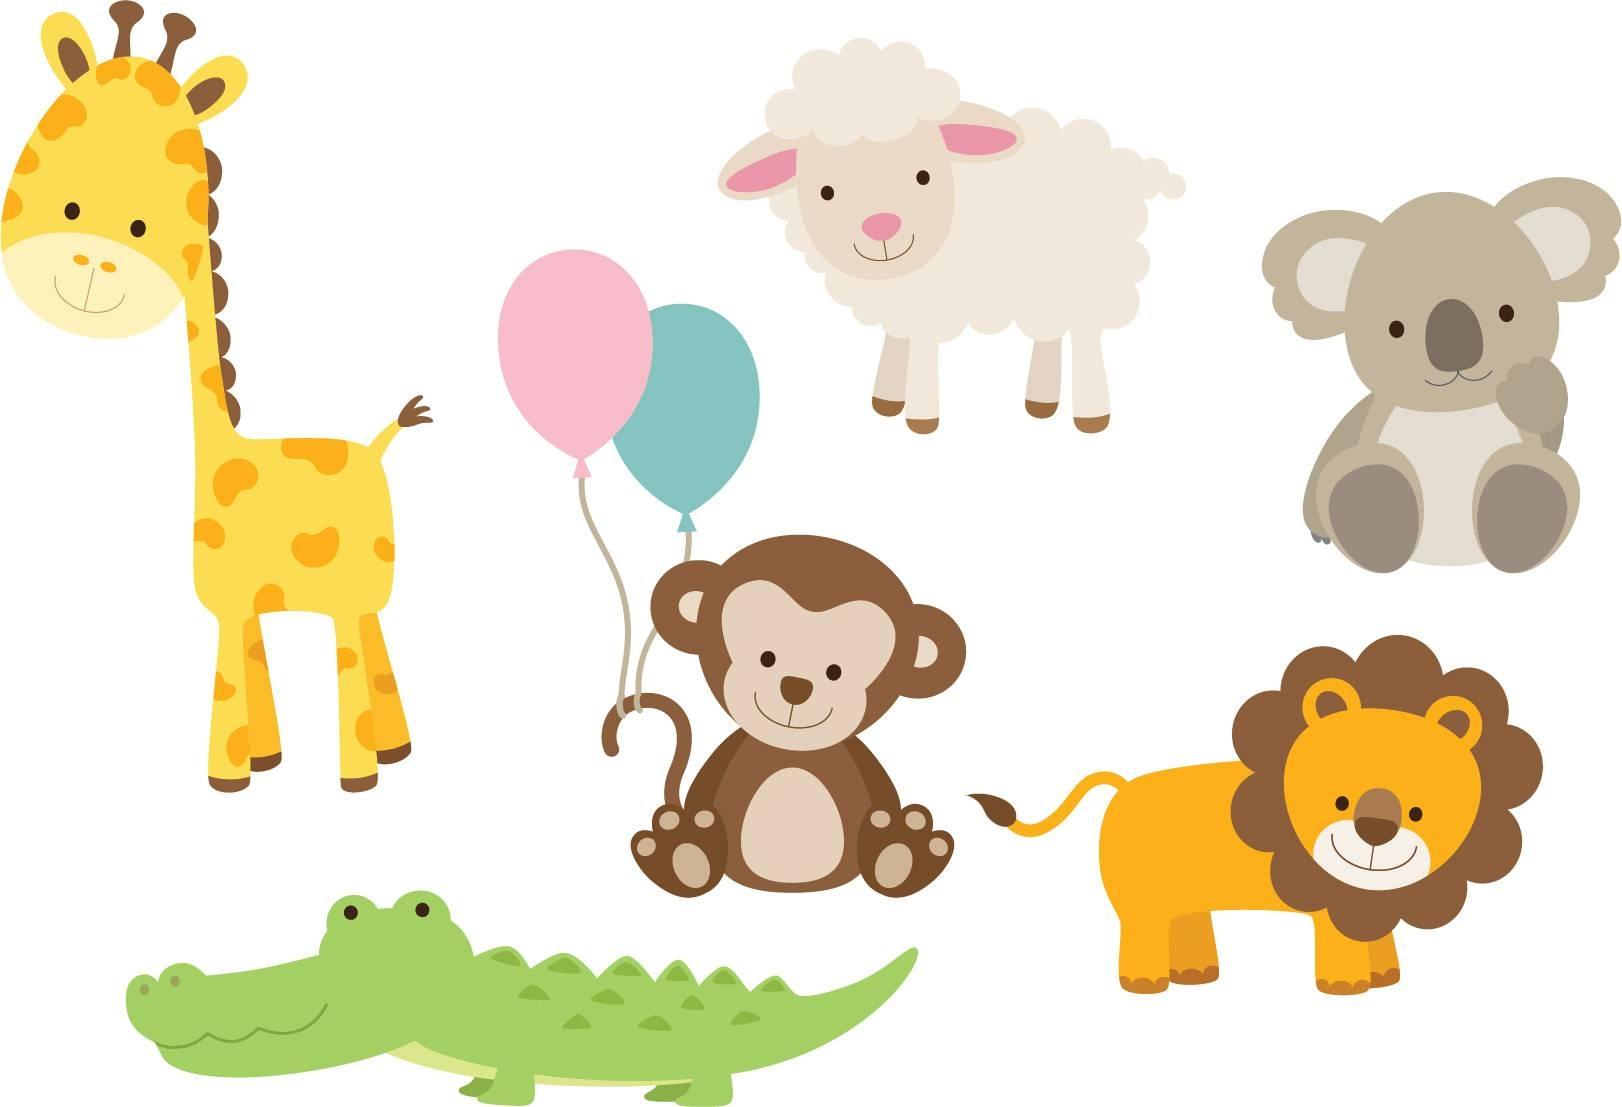 Animal Decals For Nursery | Baby Animal Wall Stickers In 2017 NurseryAnimal Wall Art (View 2 of 20)